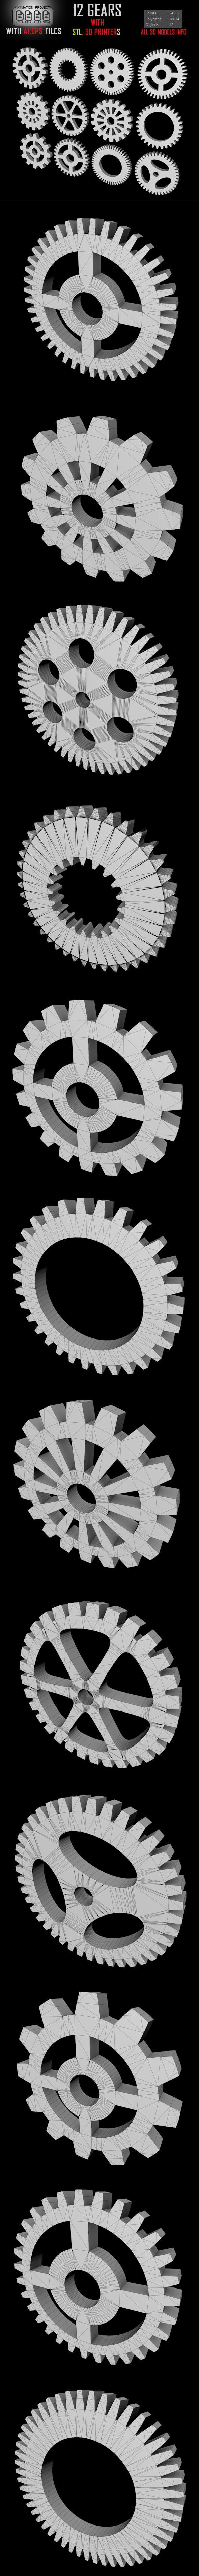 12 Gears 3D ModelS - 3DOcean Item for Sale